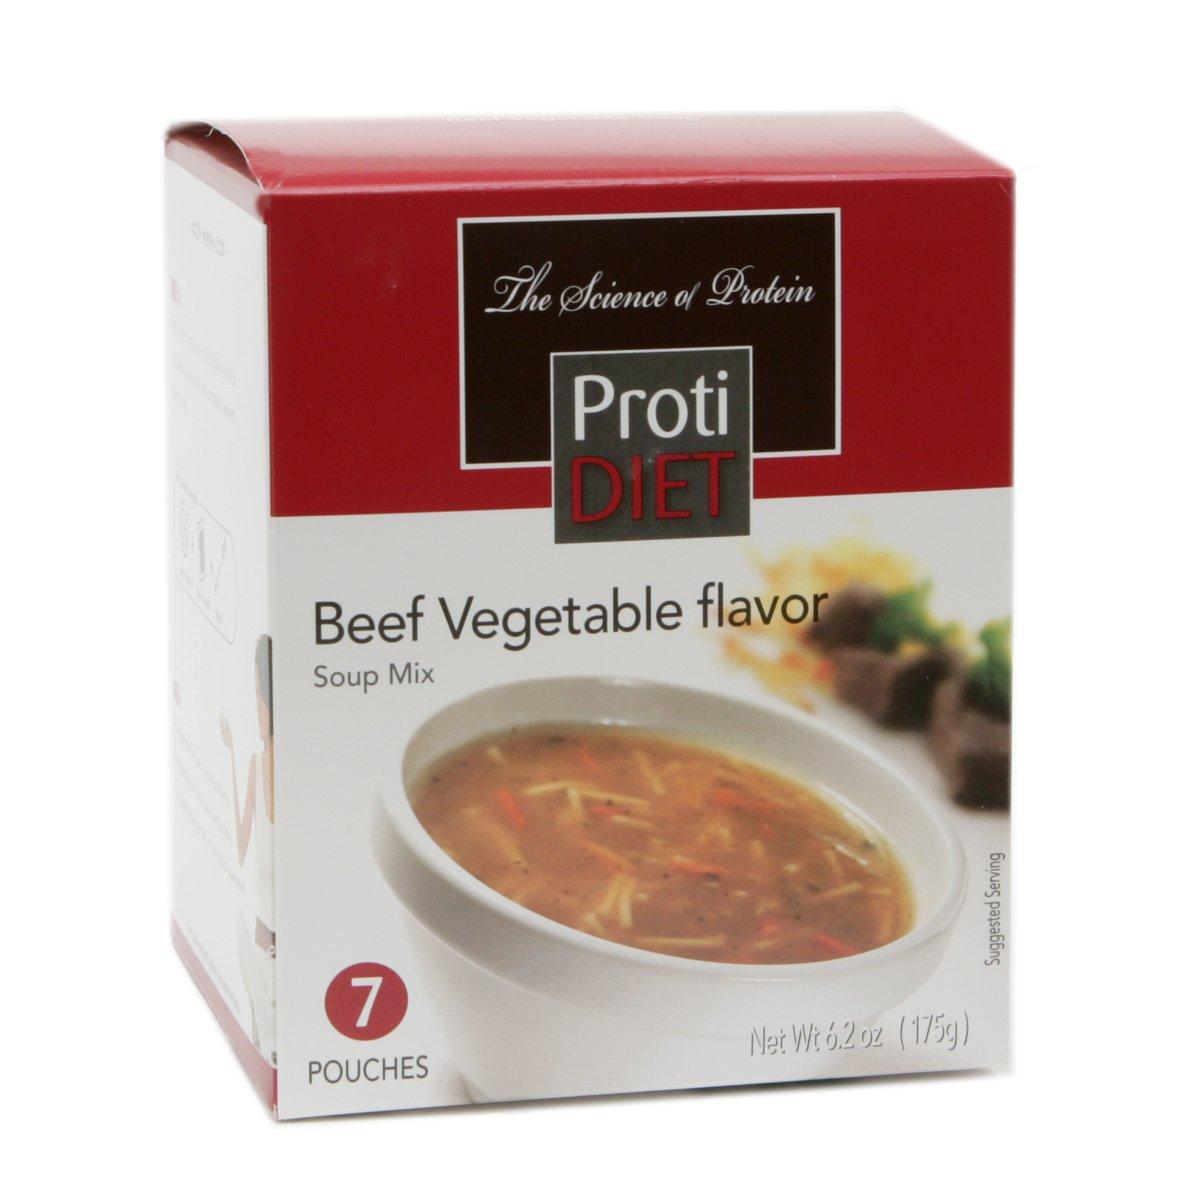 Protidiet Beef Vegetable Flavor Protein Soup Mix (7 - 6.2 oz Pouches)